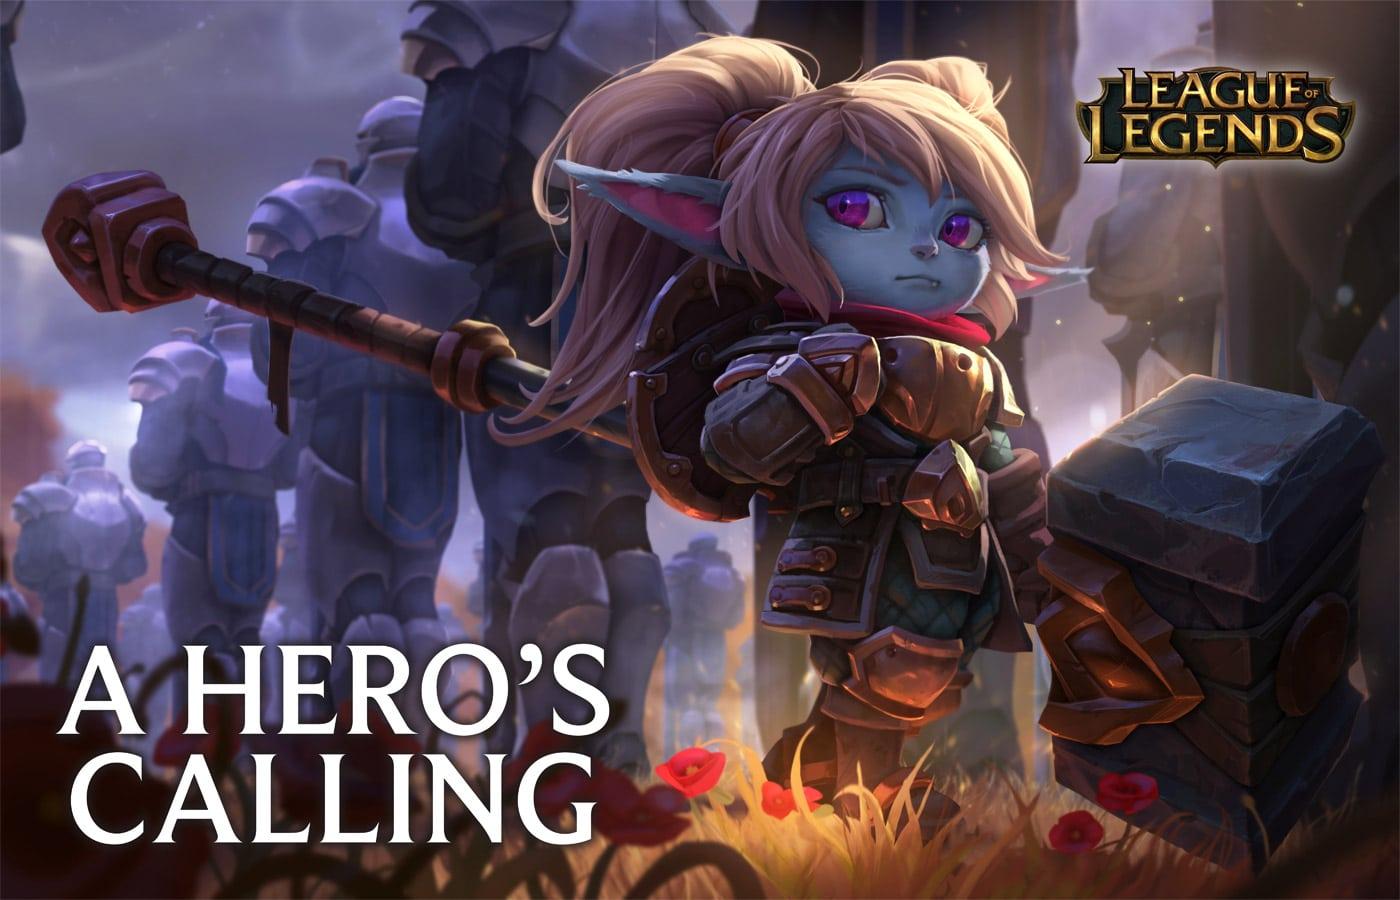 a hero's calling